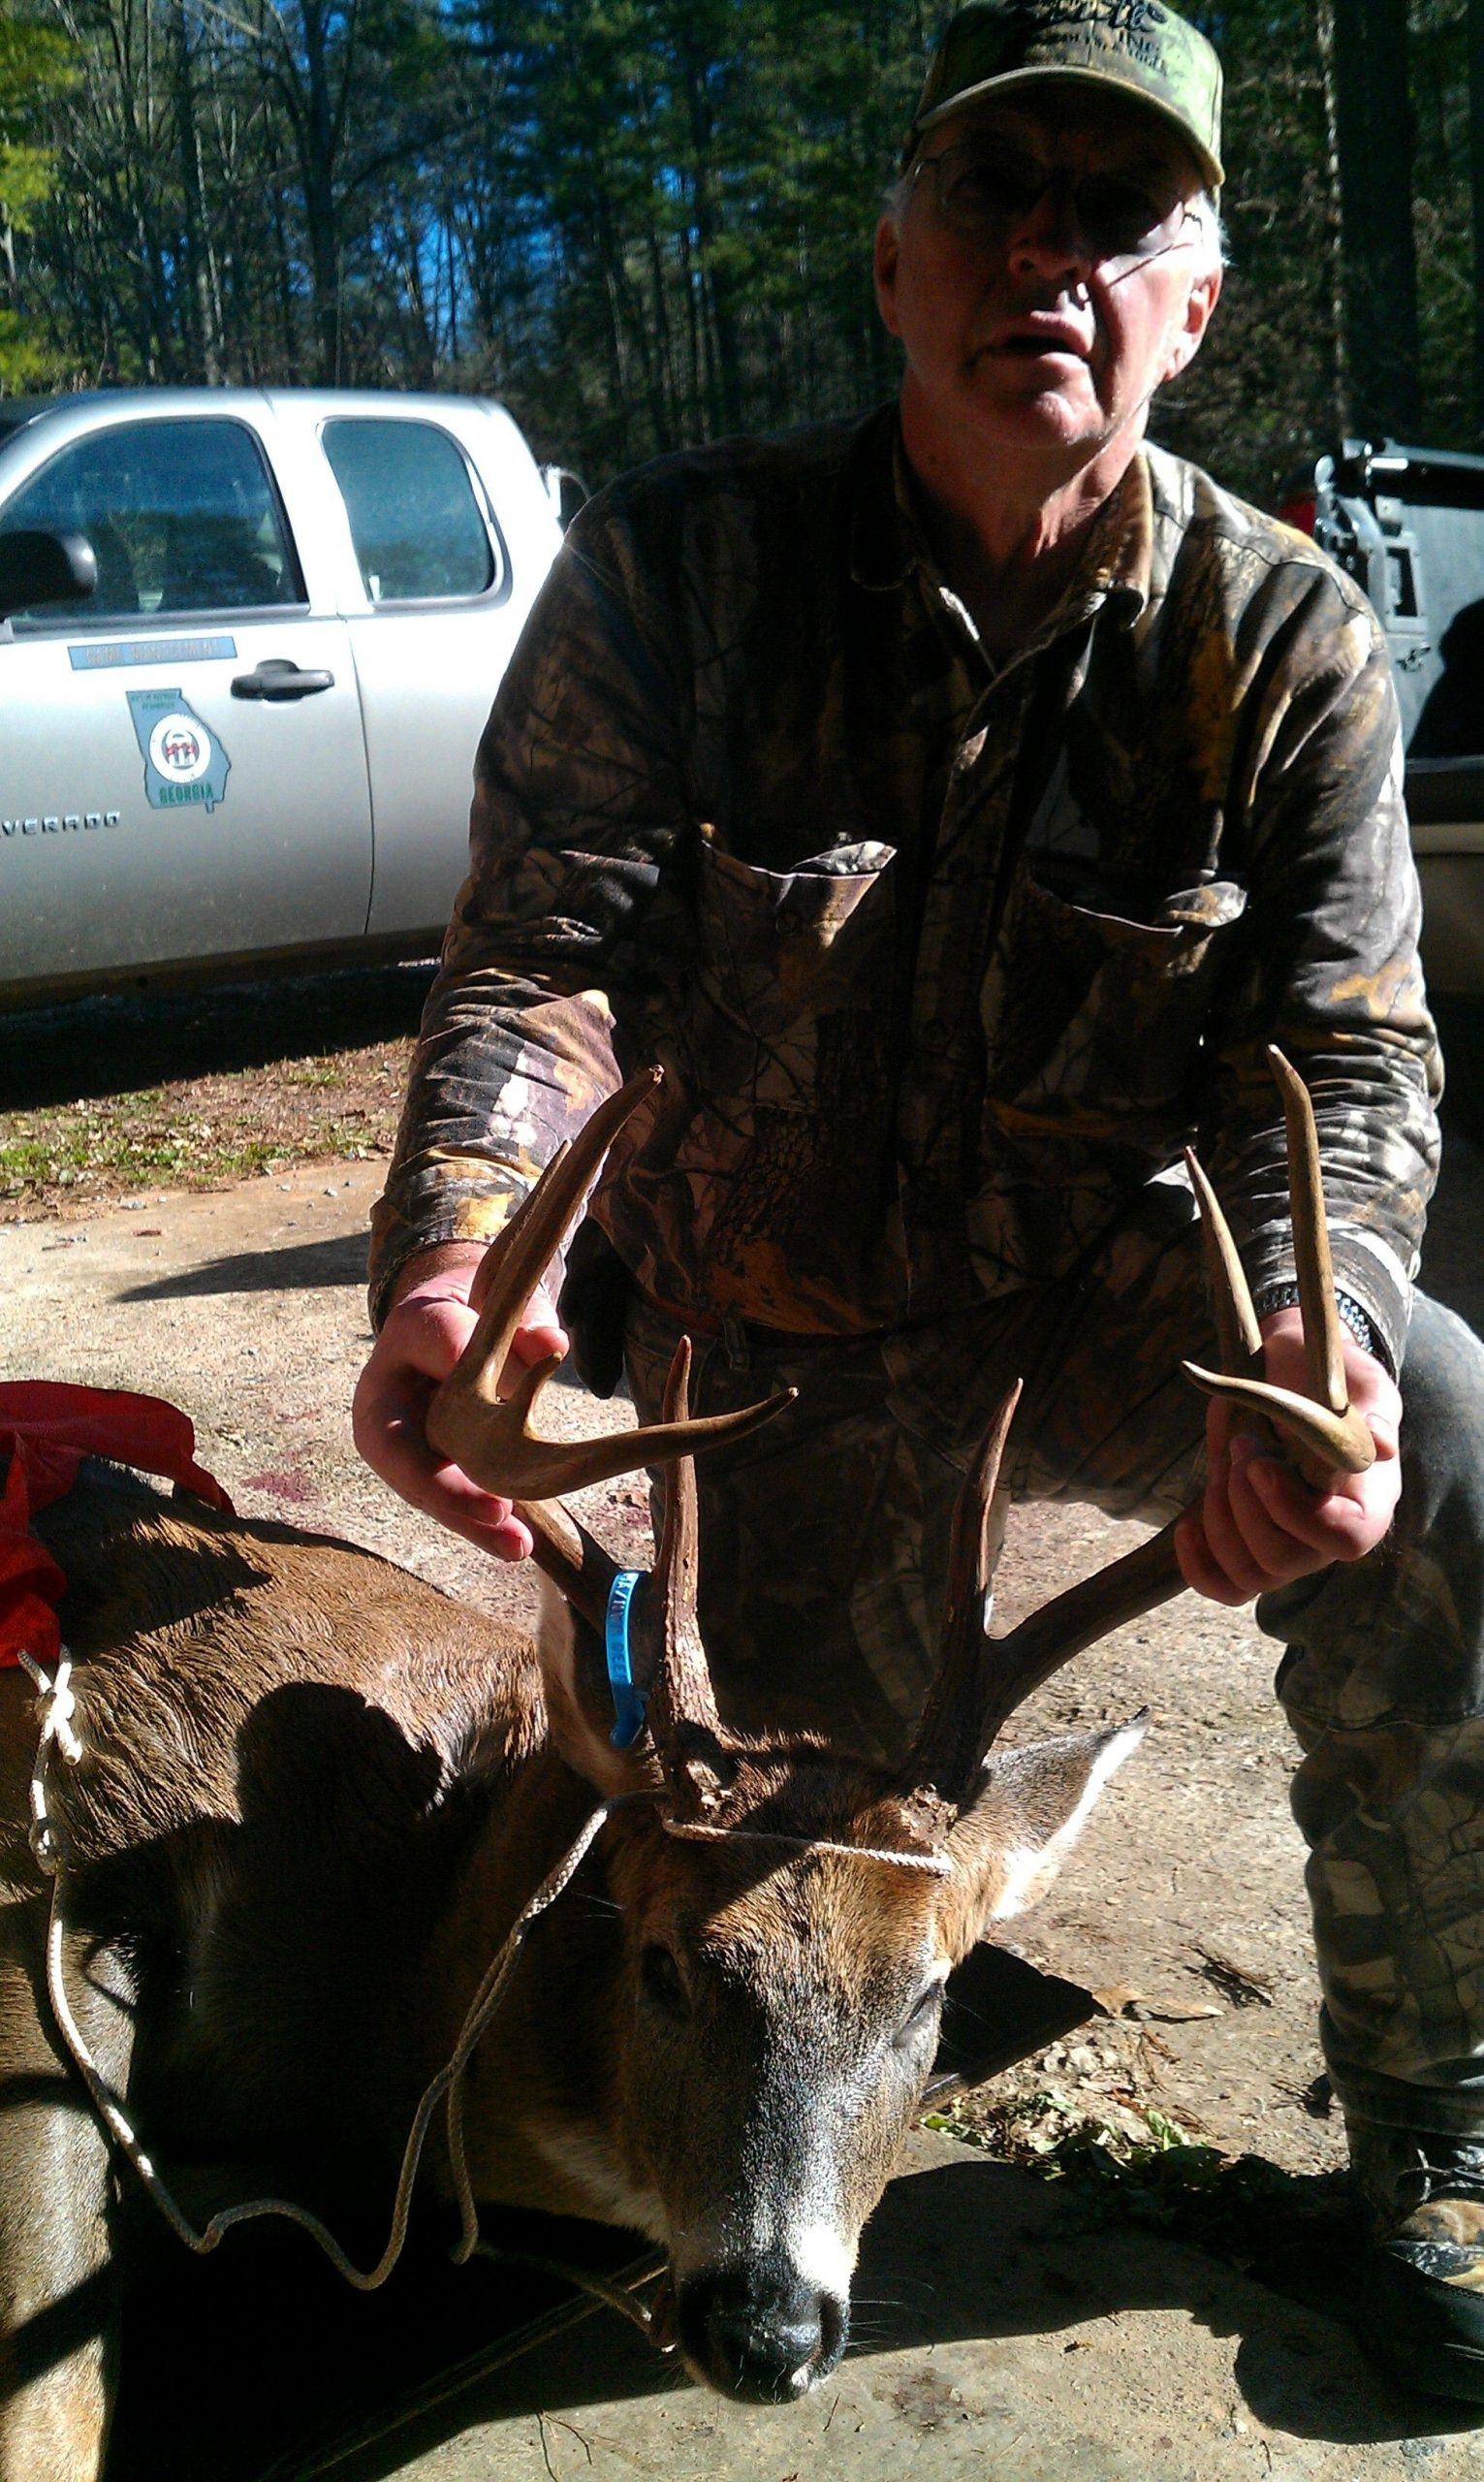 Https://Georgiawildlife.blog/2011/08/02/Survey-Predicts-Strong  20/21Georgia Deer Rut